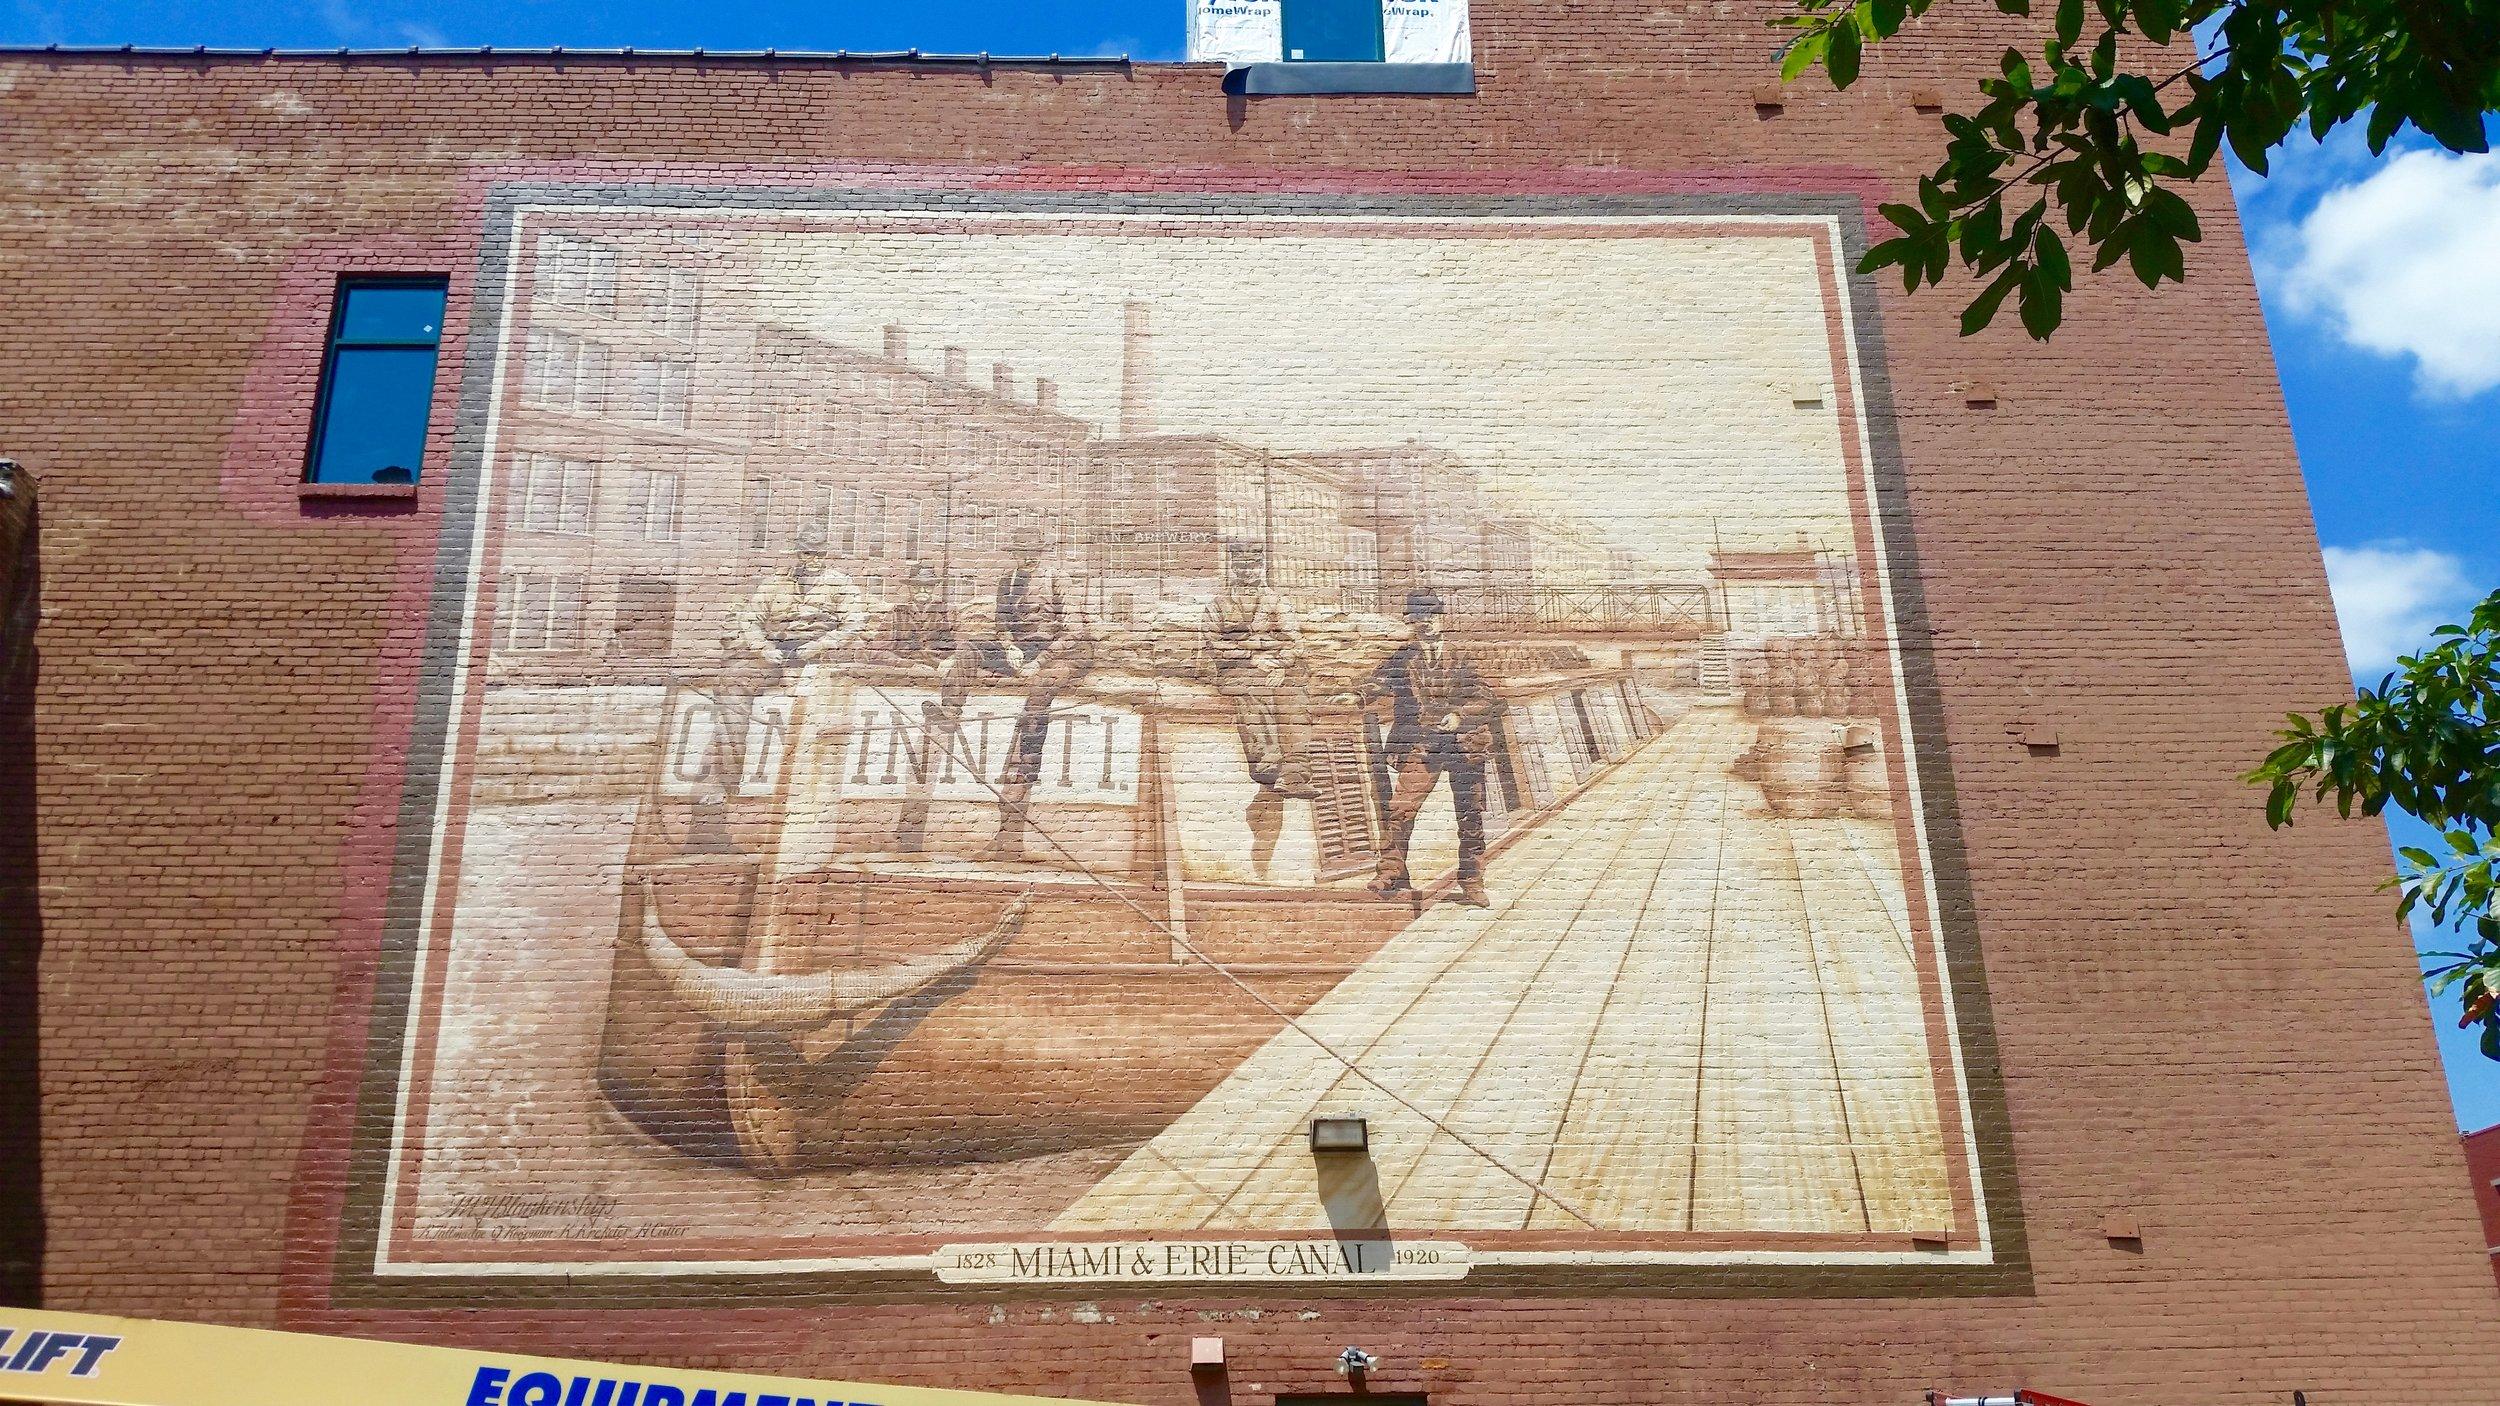 One of many beautiful murals and street art installations in Cincinnati